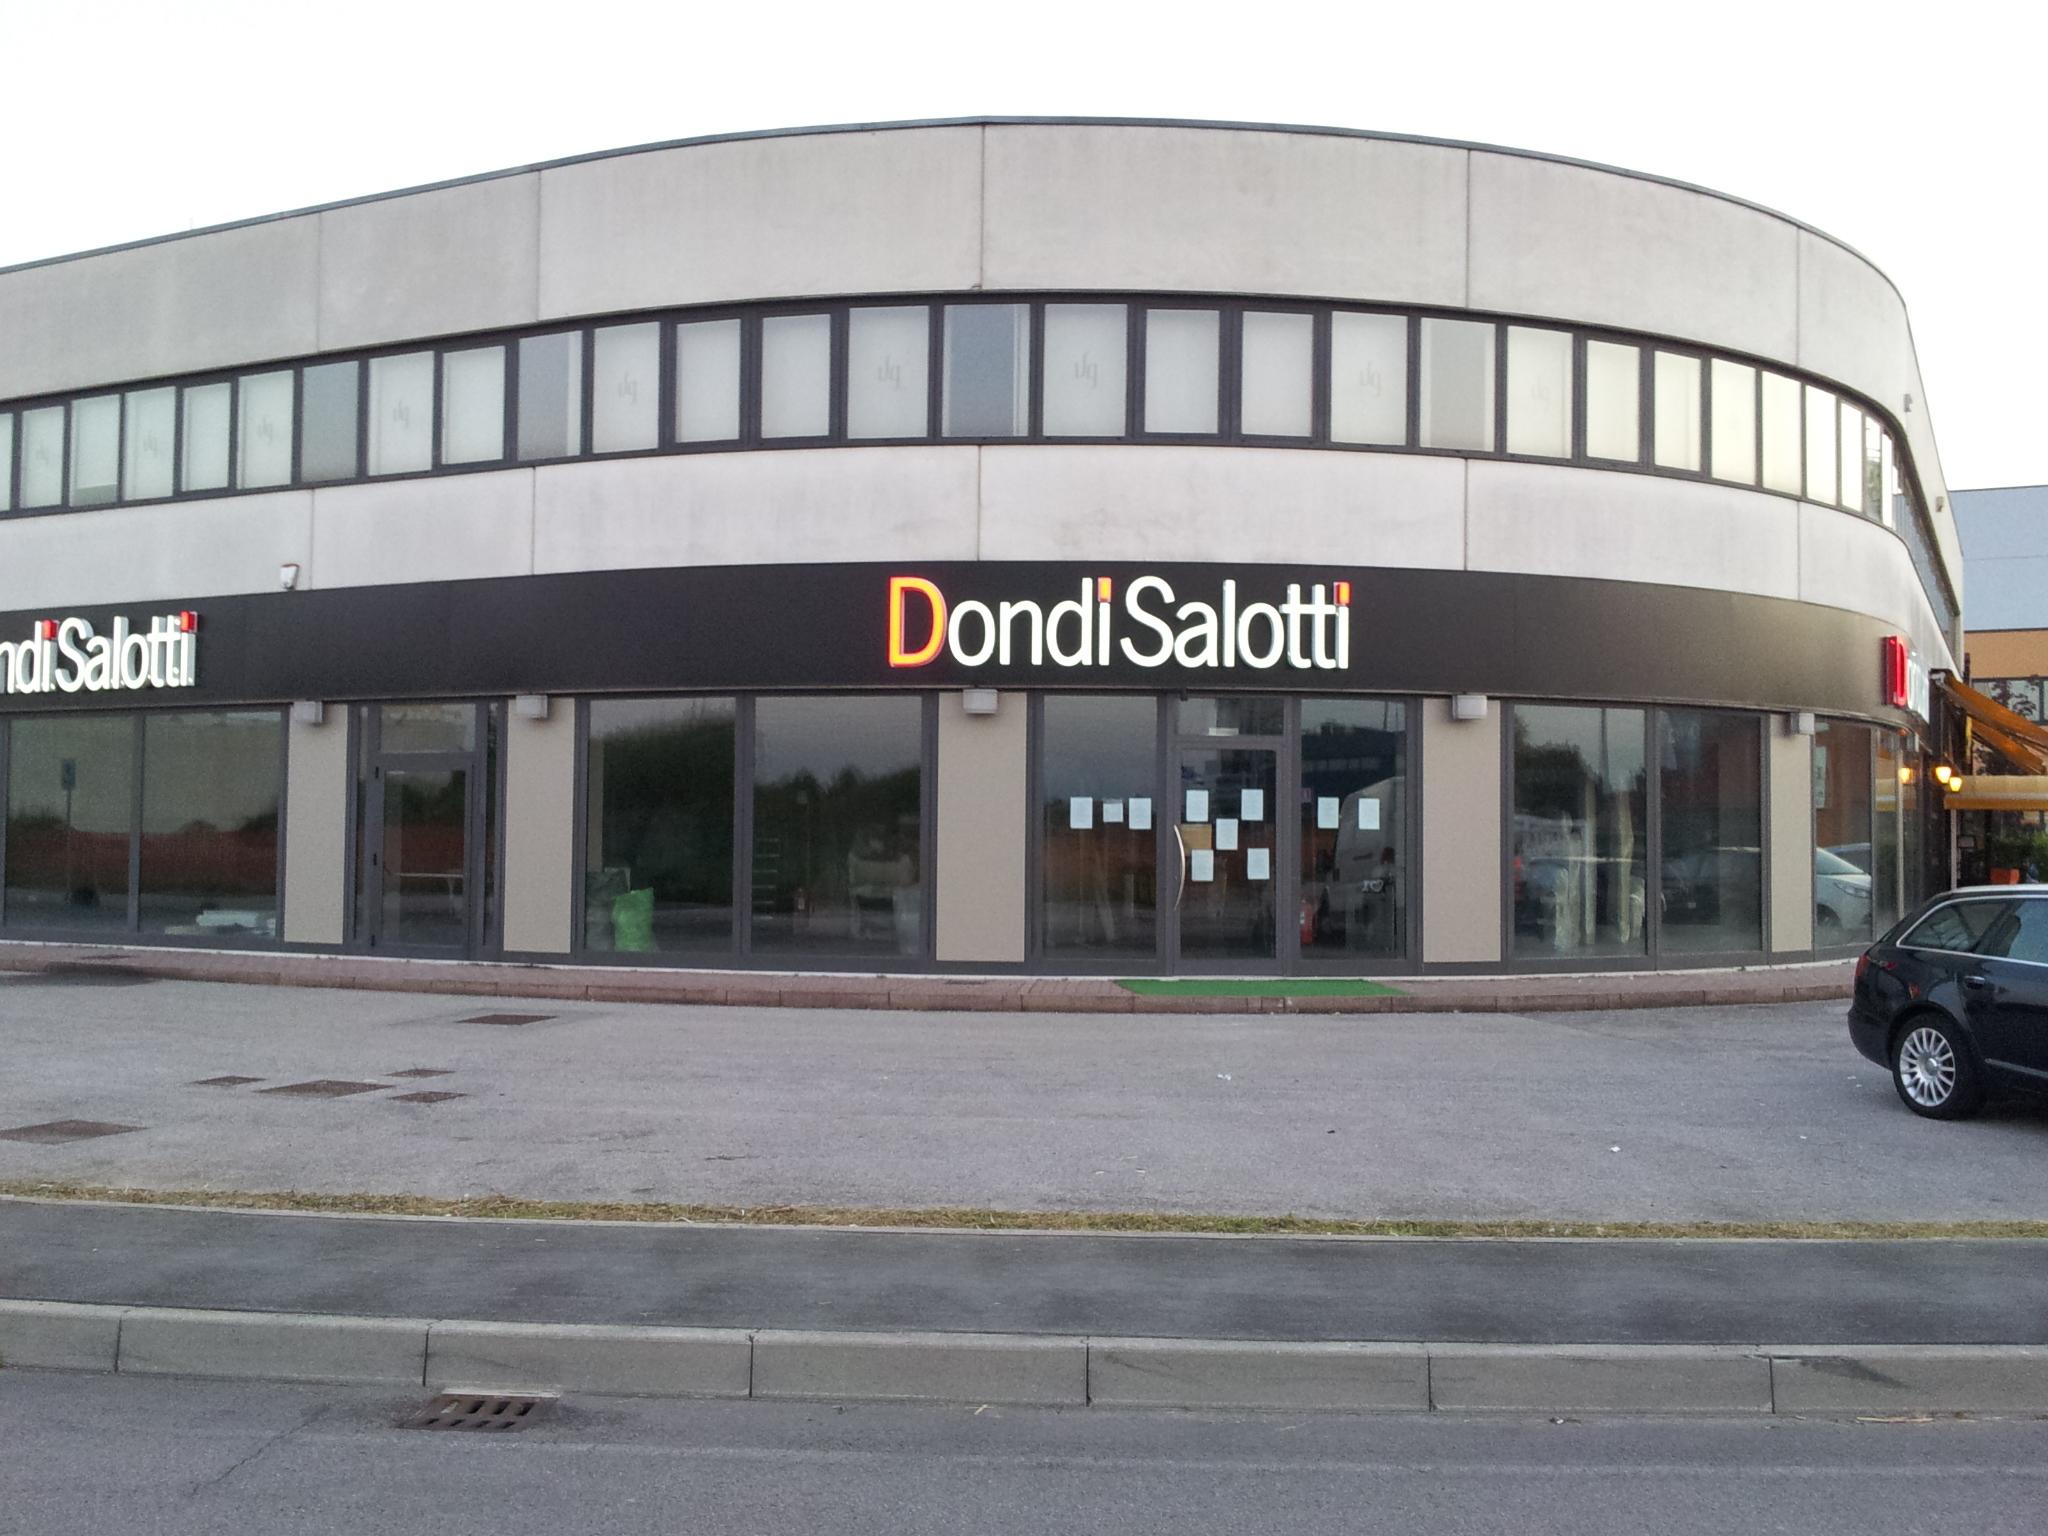 Dondi Salotti Vicenza.Dondi Salotti Emmebi Sign